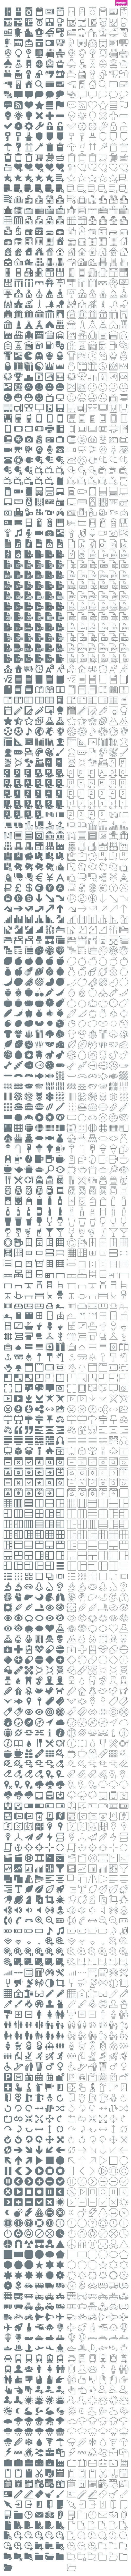 B 扁平图形 icon   Royalty free icons, Website inspiration, Icon design